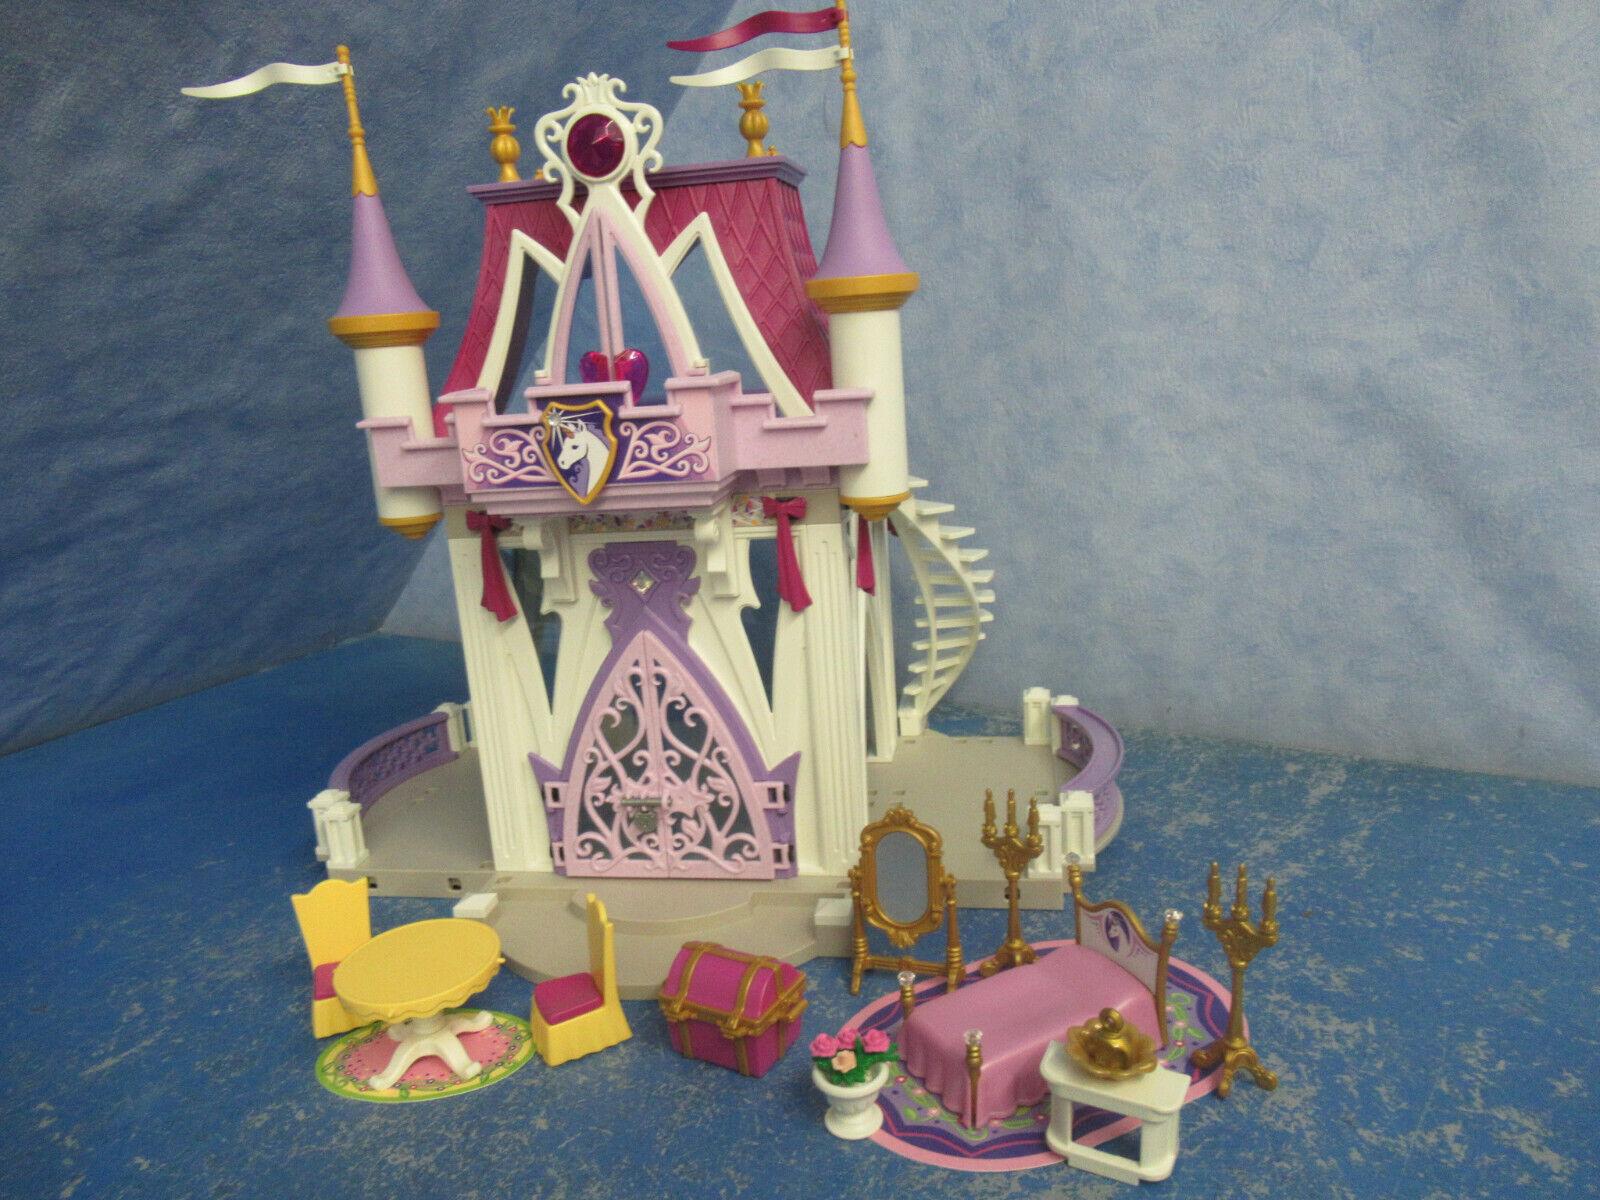 5474 Castello  di cristtuttio mobili ampliamento a 9469 Crystal Palace PLAYMOBIL 8595  moda